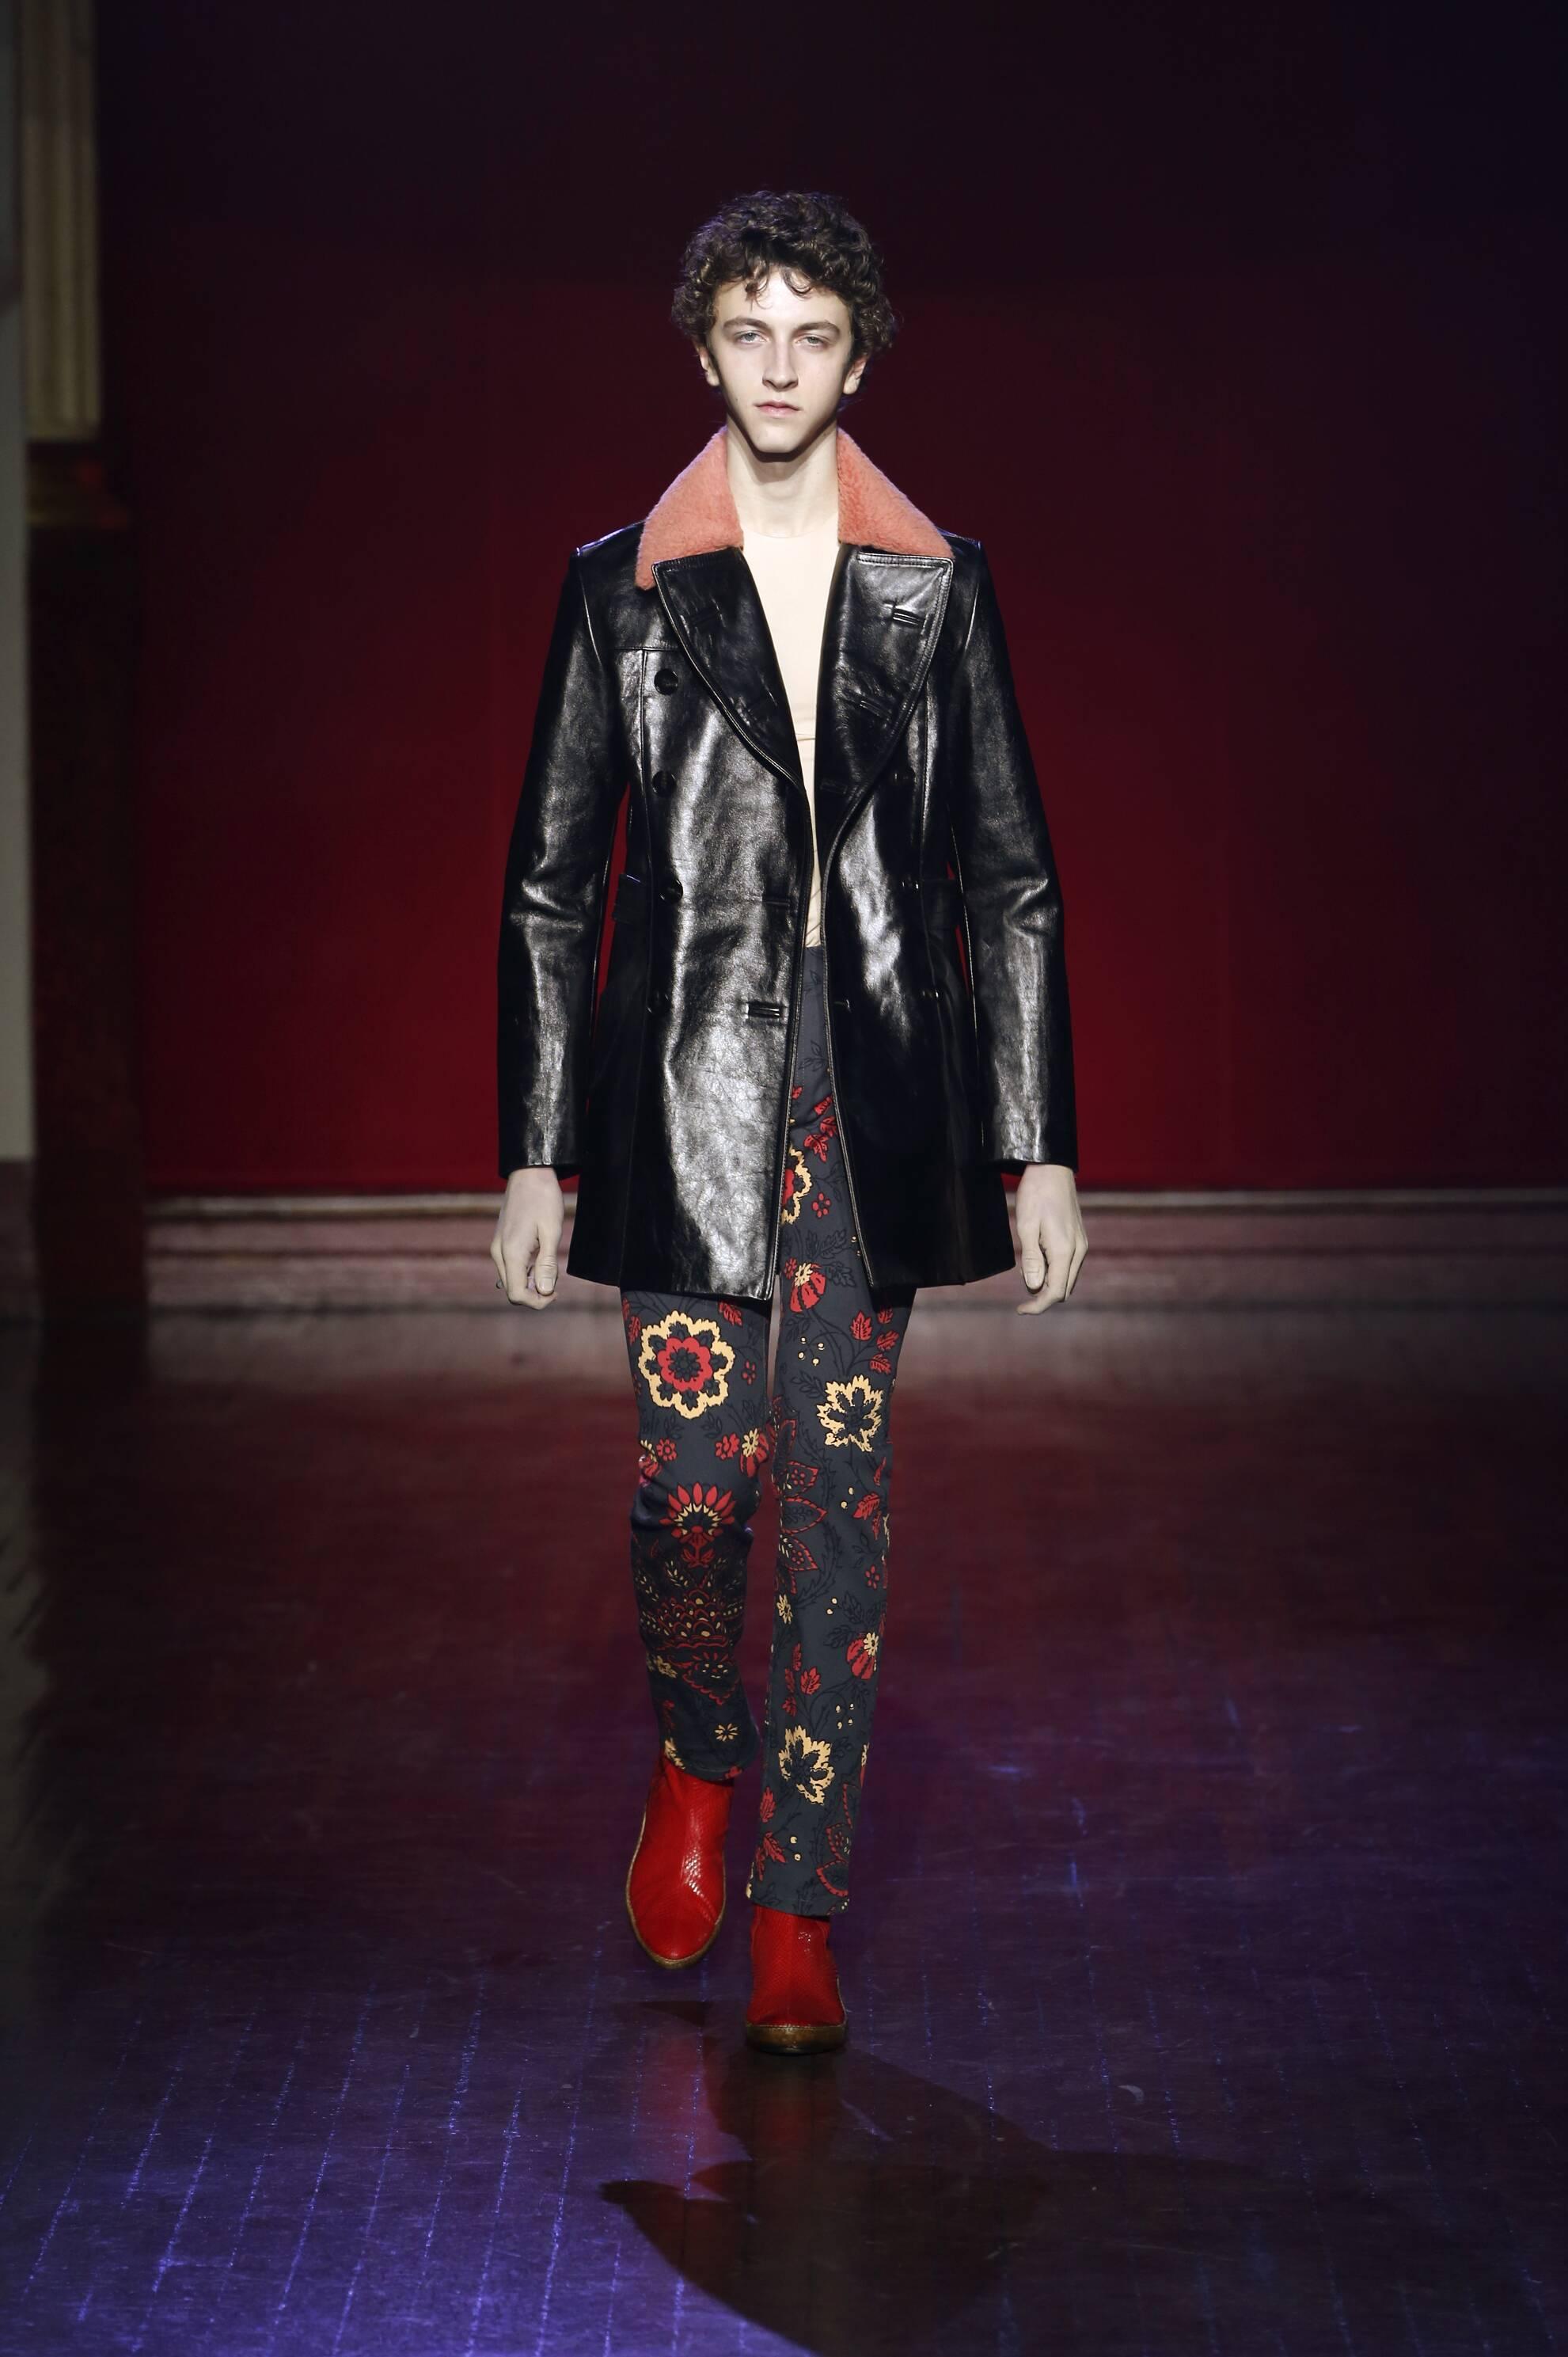 Maison Margiela Fall Winter 2015 16 Men's Collection Paris Fashion Week Fashion Show